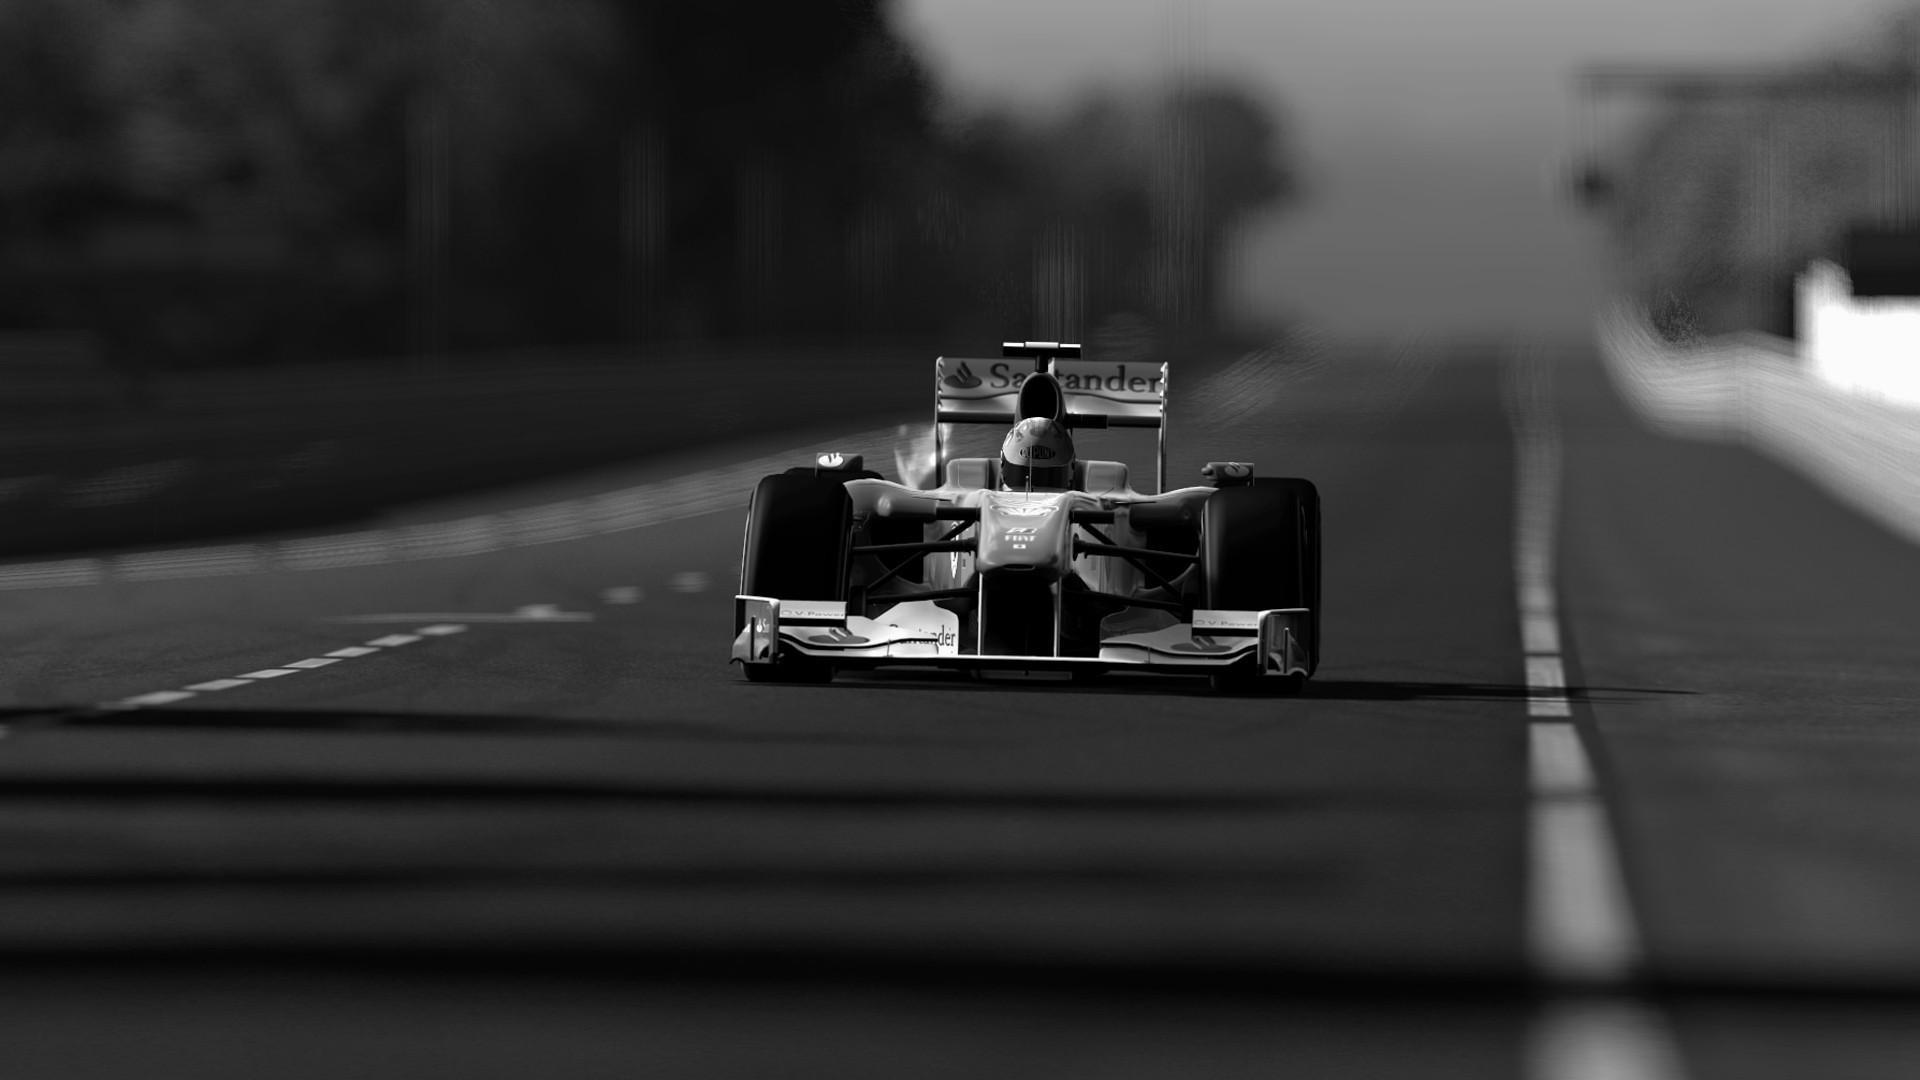 wallpaper.wiki-Formula-1-car-hd-wallpapers-PIC-